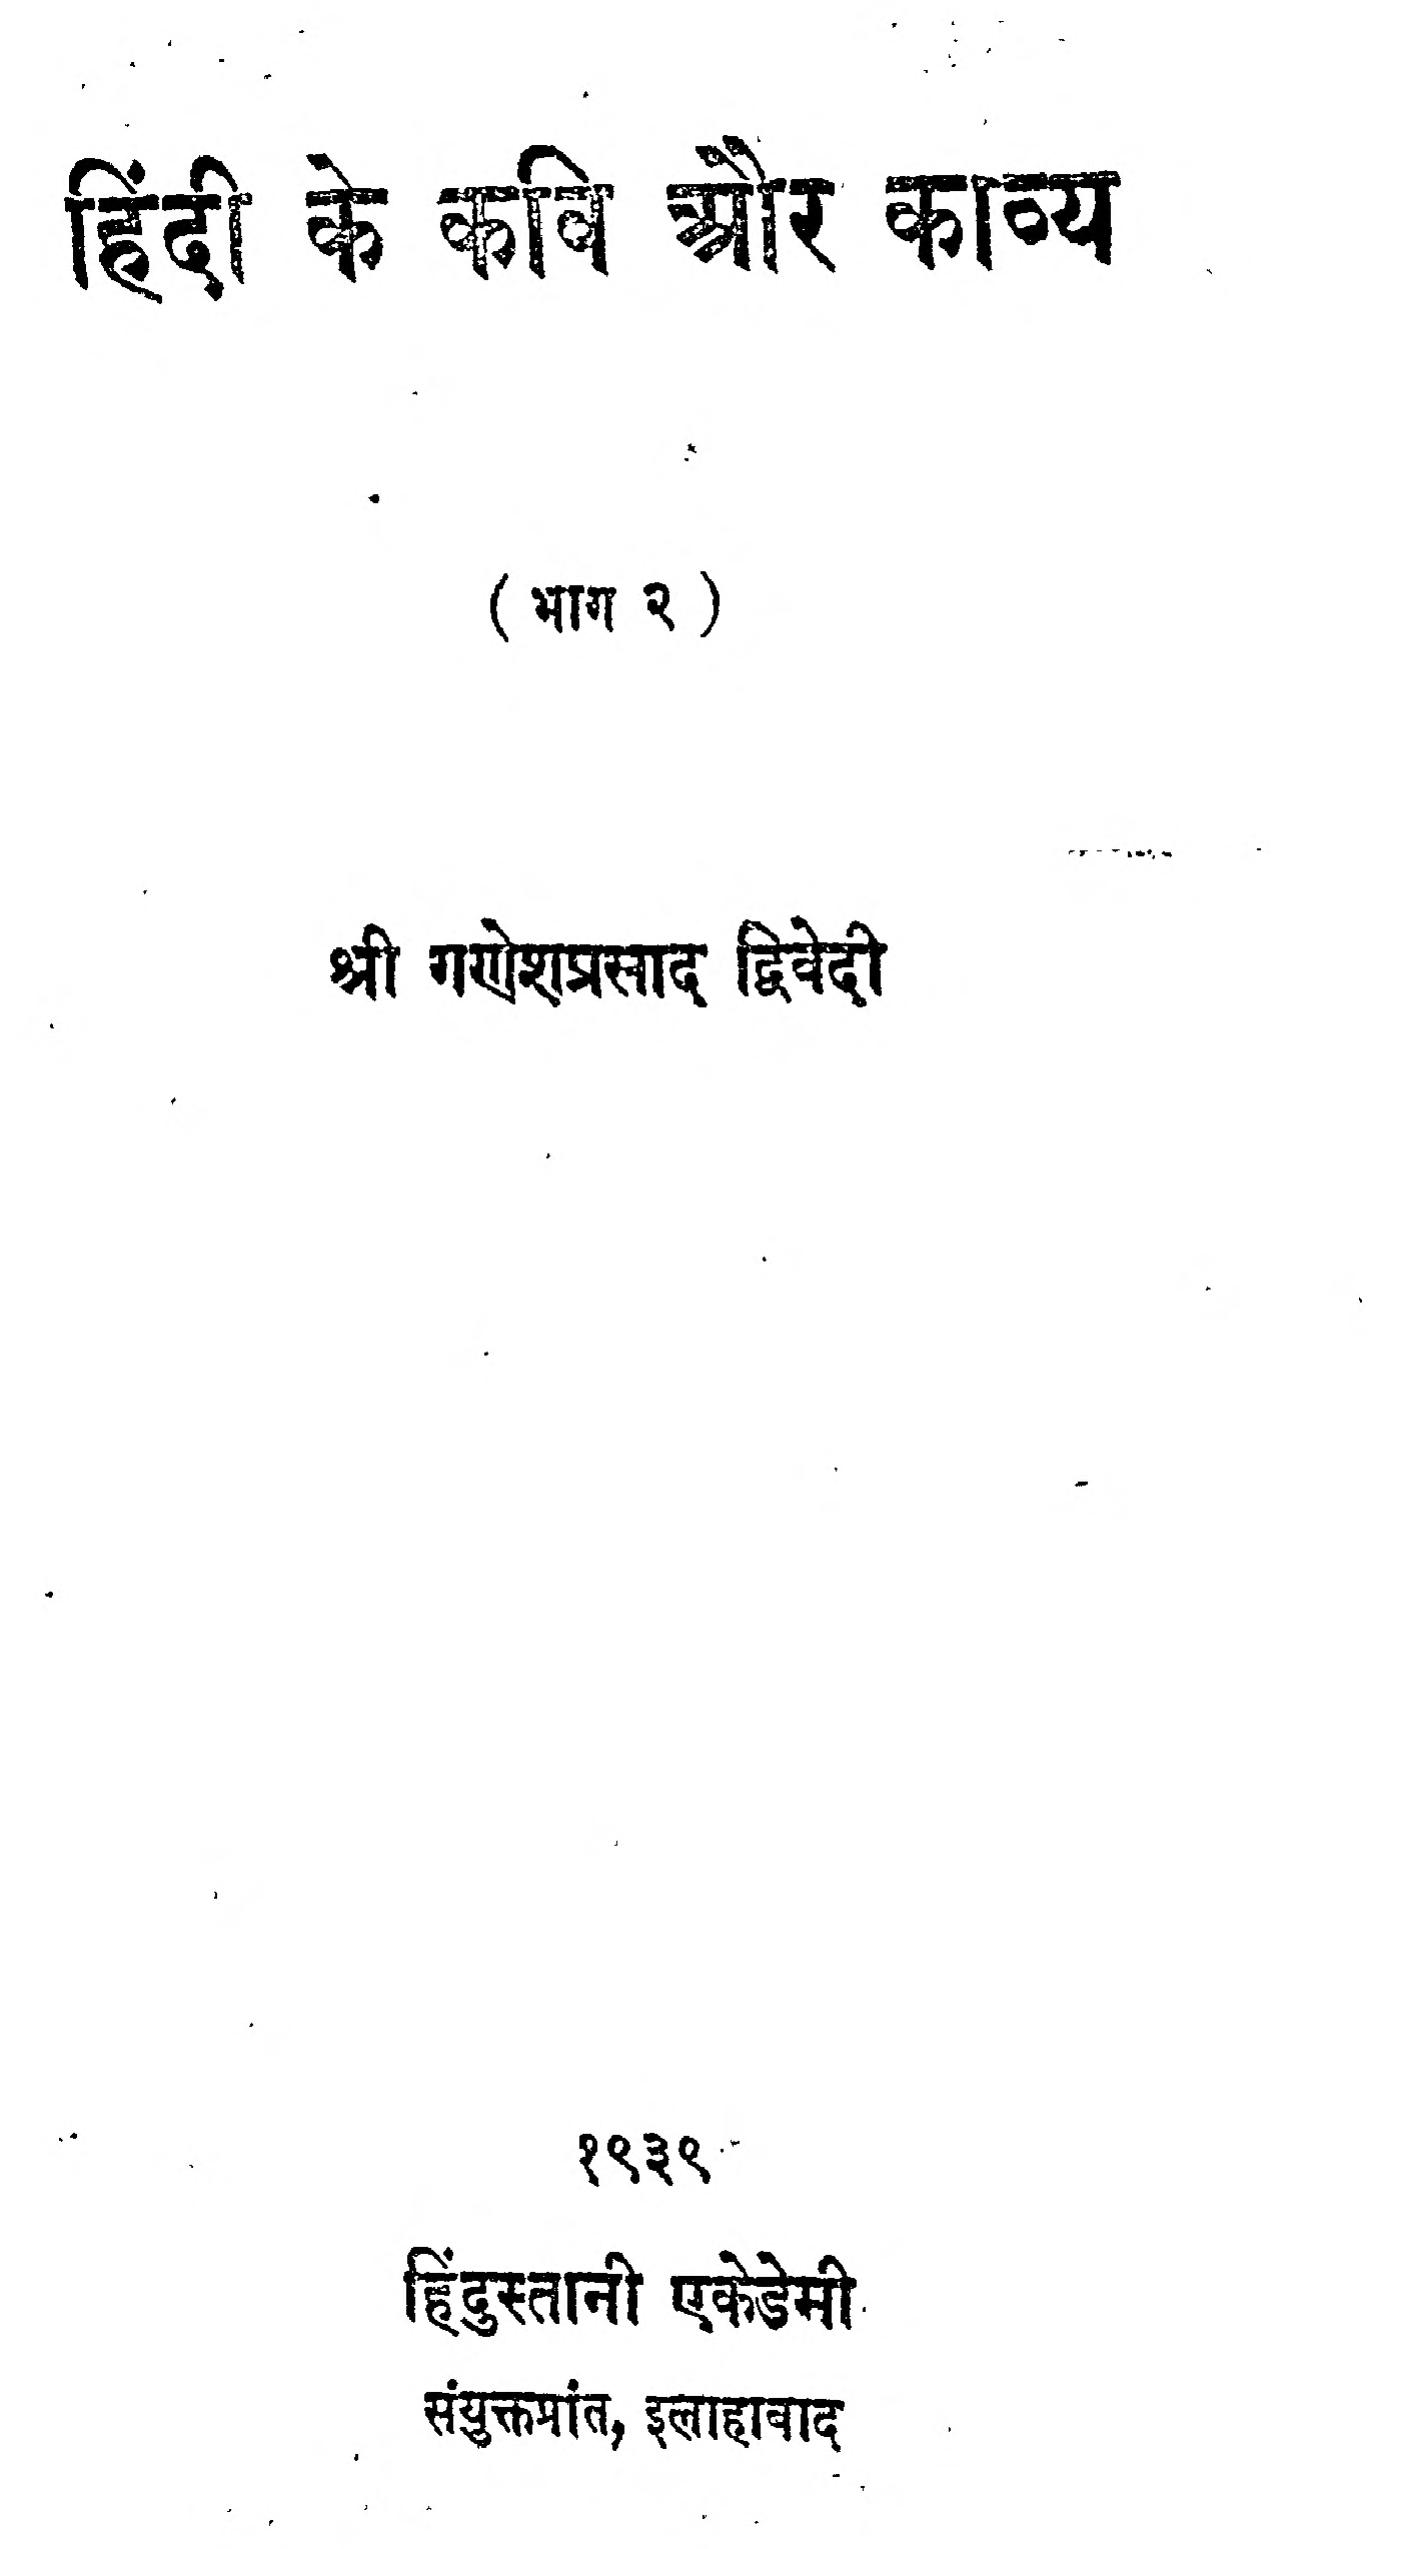 Book Image : हिन्दी के कवि और काव्य भाग 2  - Hindi Ke Kavi Aur Kavya Bhag 2